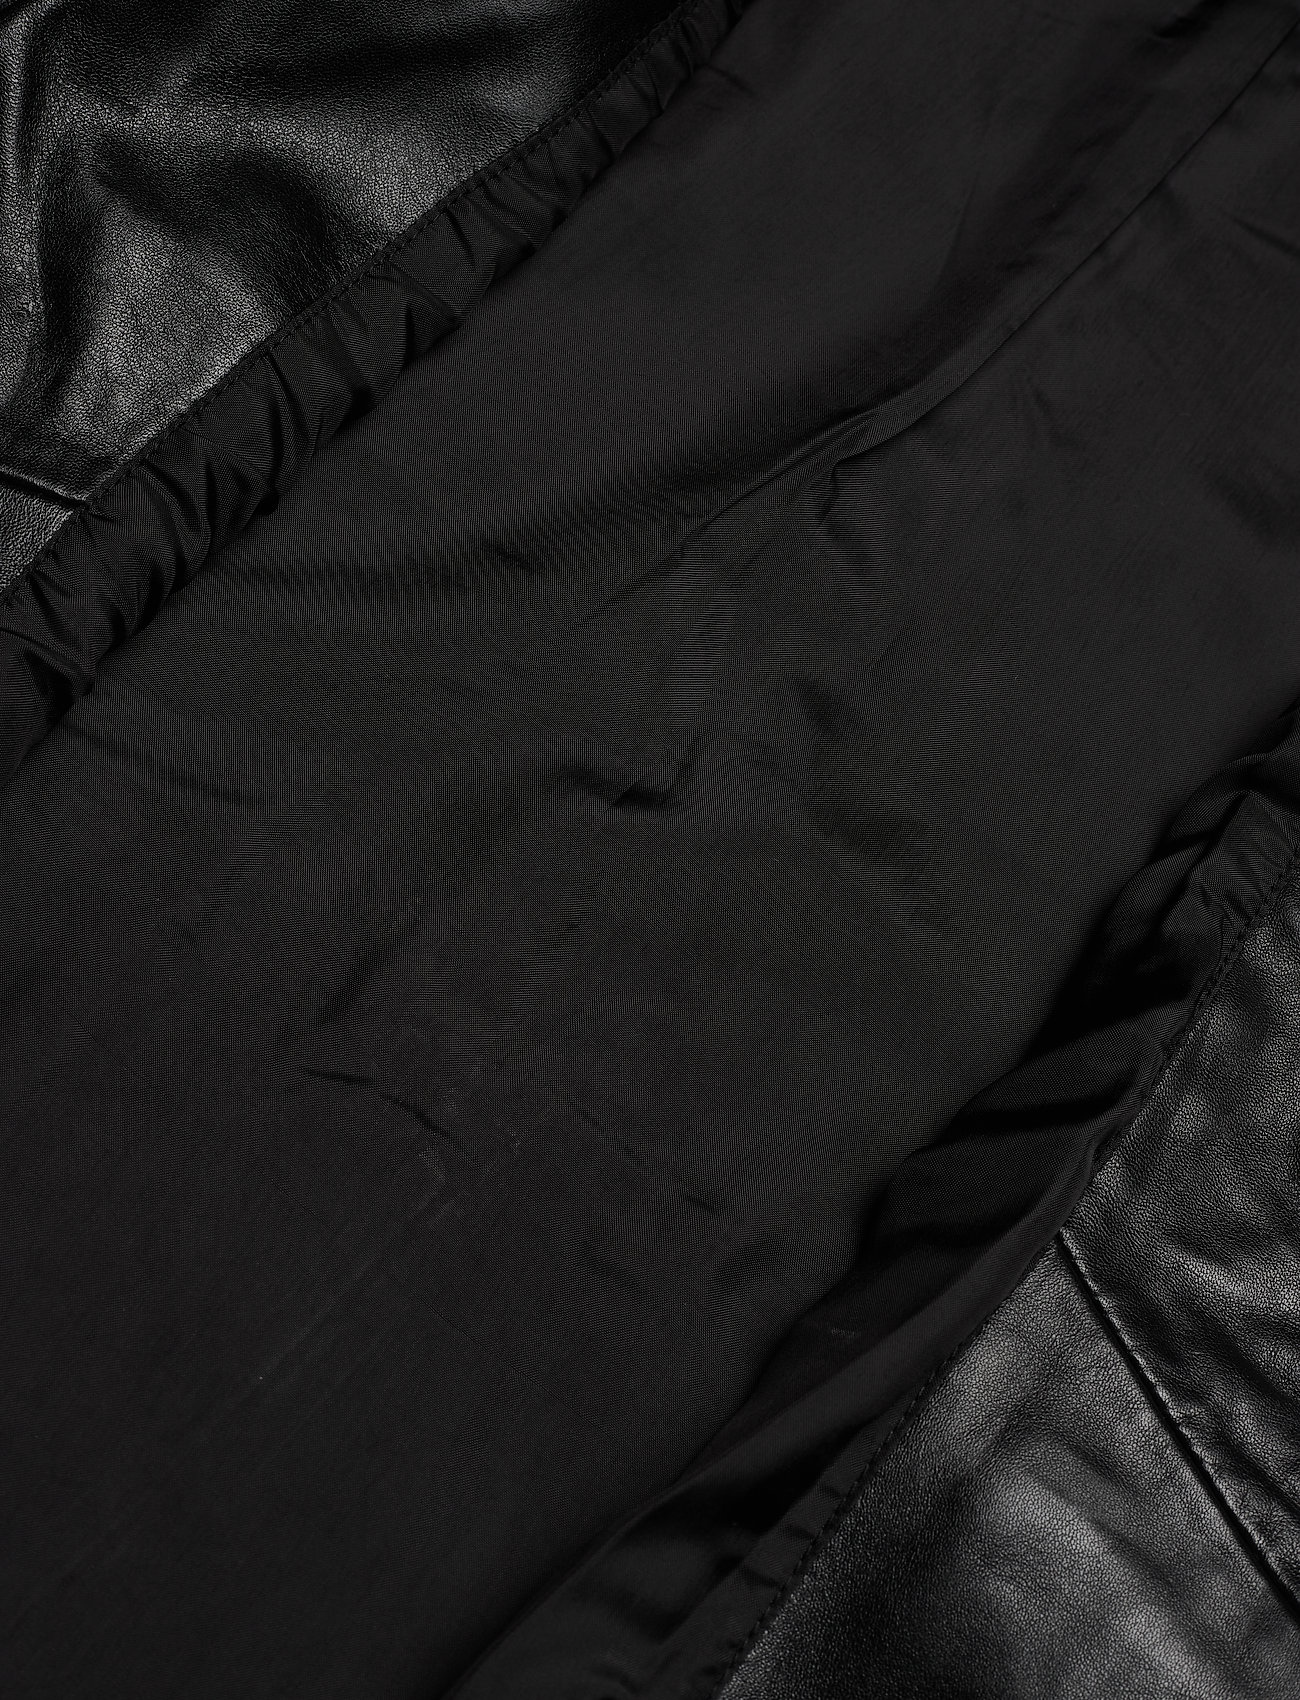 7544 - Ginetta (Black) (539 €) - SAND 1GhUg